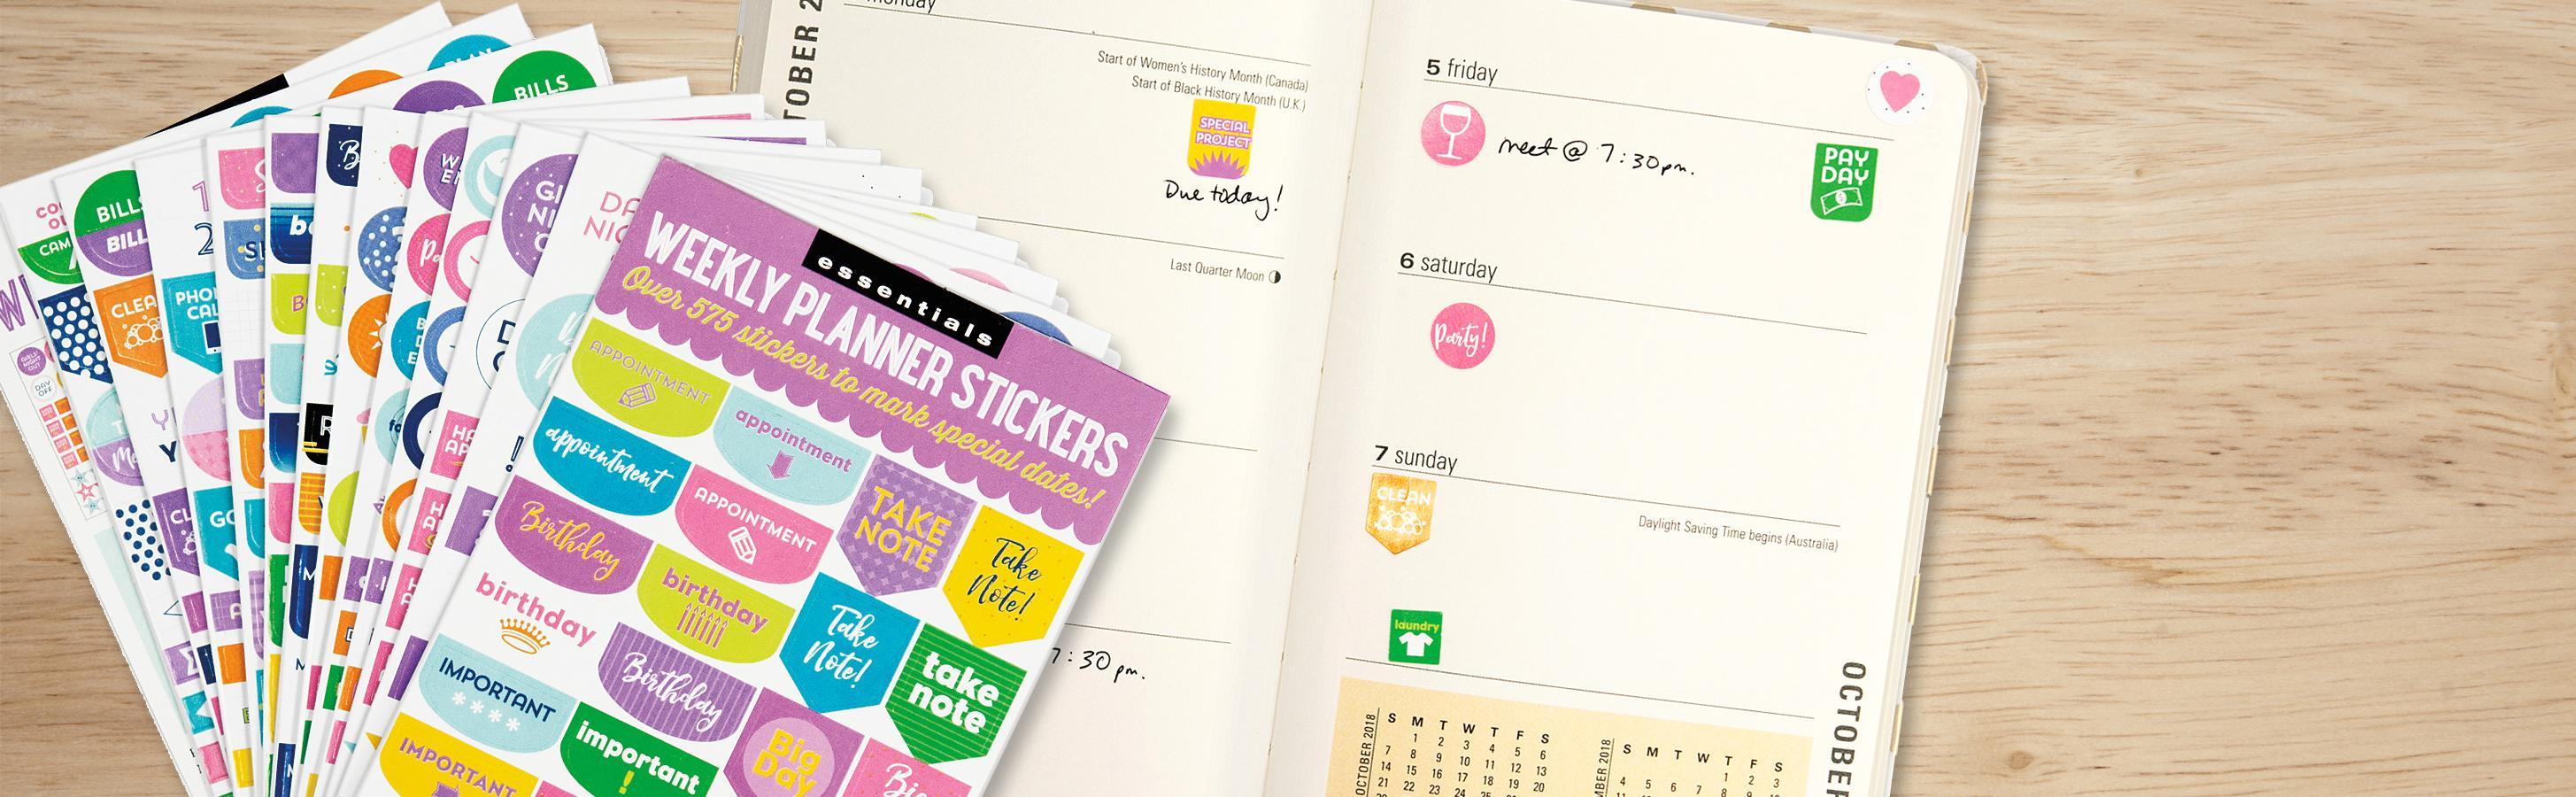 Amazon.com: Essentials Weekly Planner Stickers (Set of 575 ...